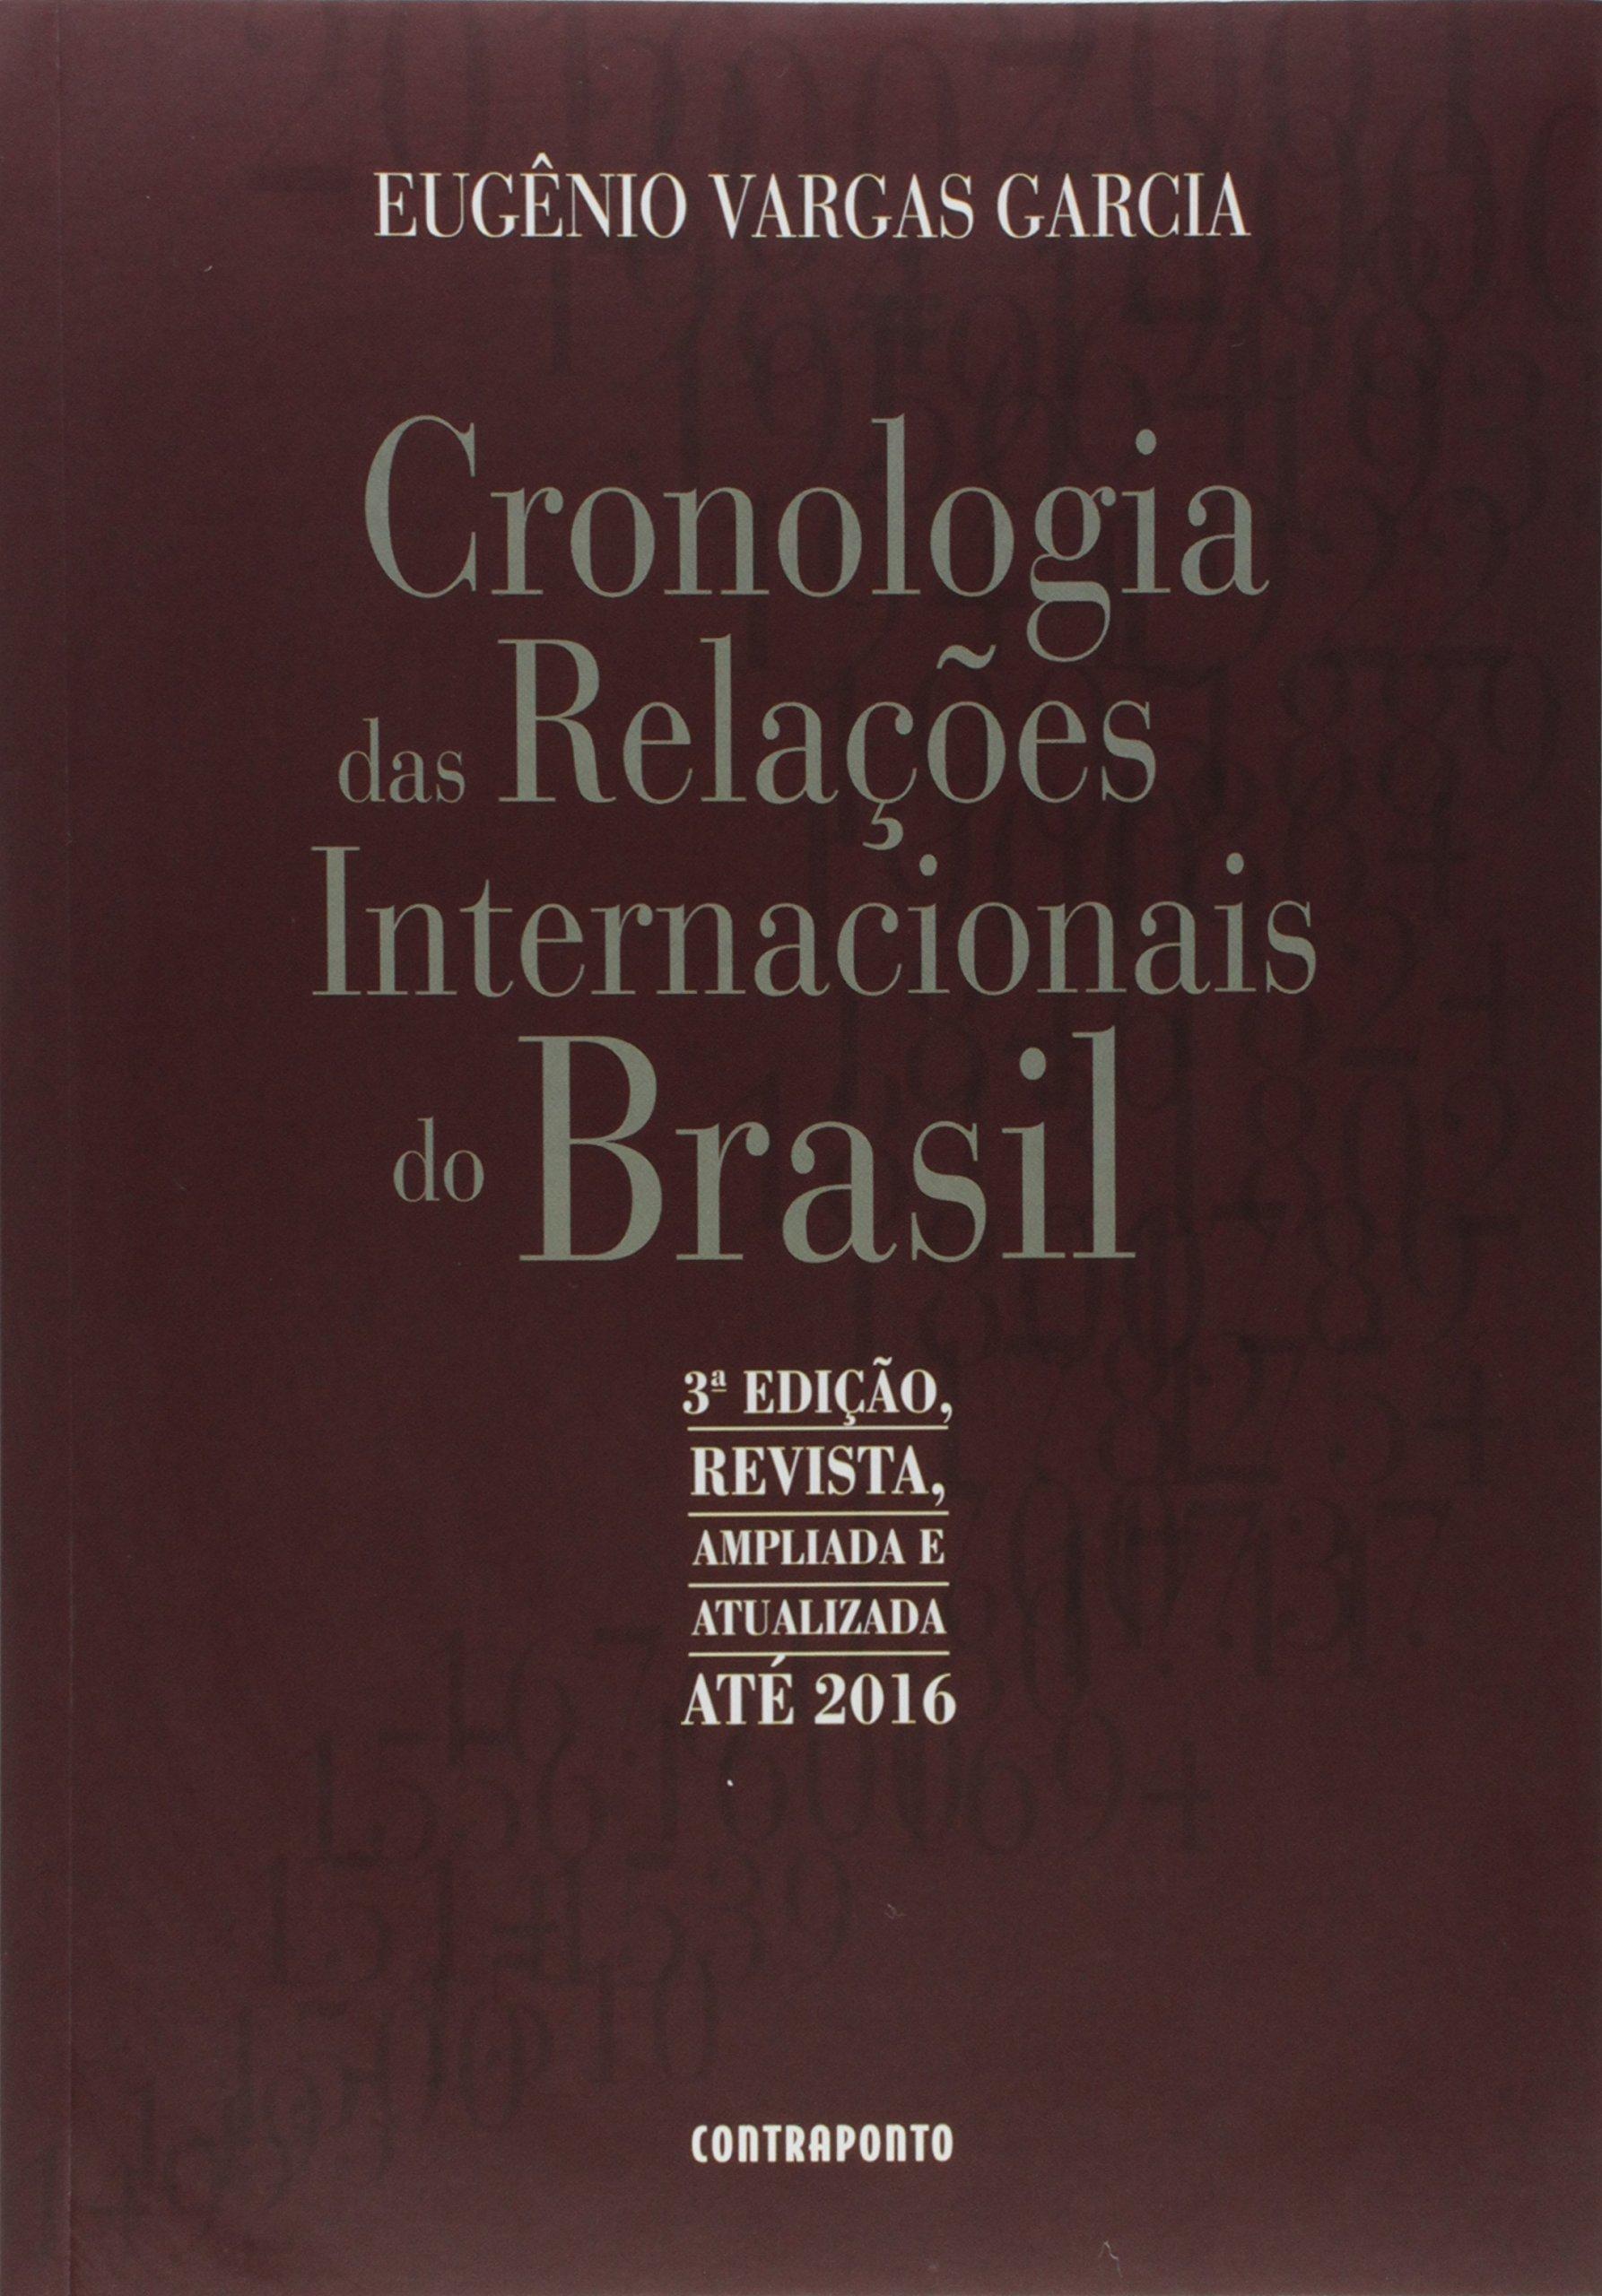 CRONOLOGIA DAS RELACOES INTERNACIONAIS DO BRASIL, livro de GARCIA, EUGENIO VARGAS